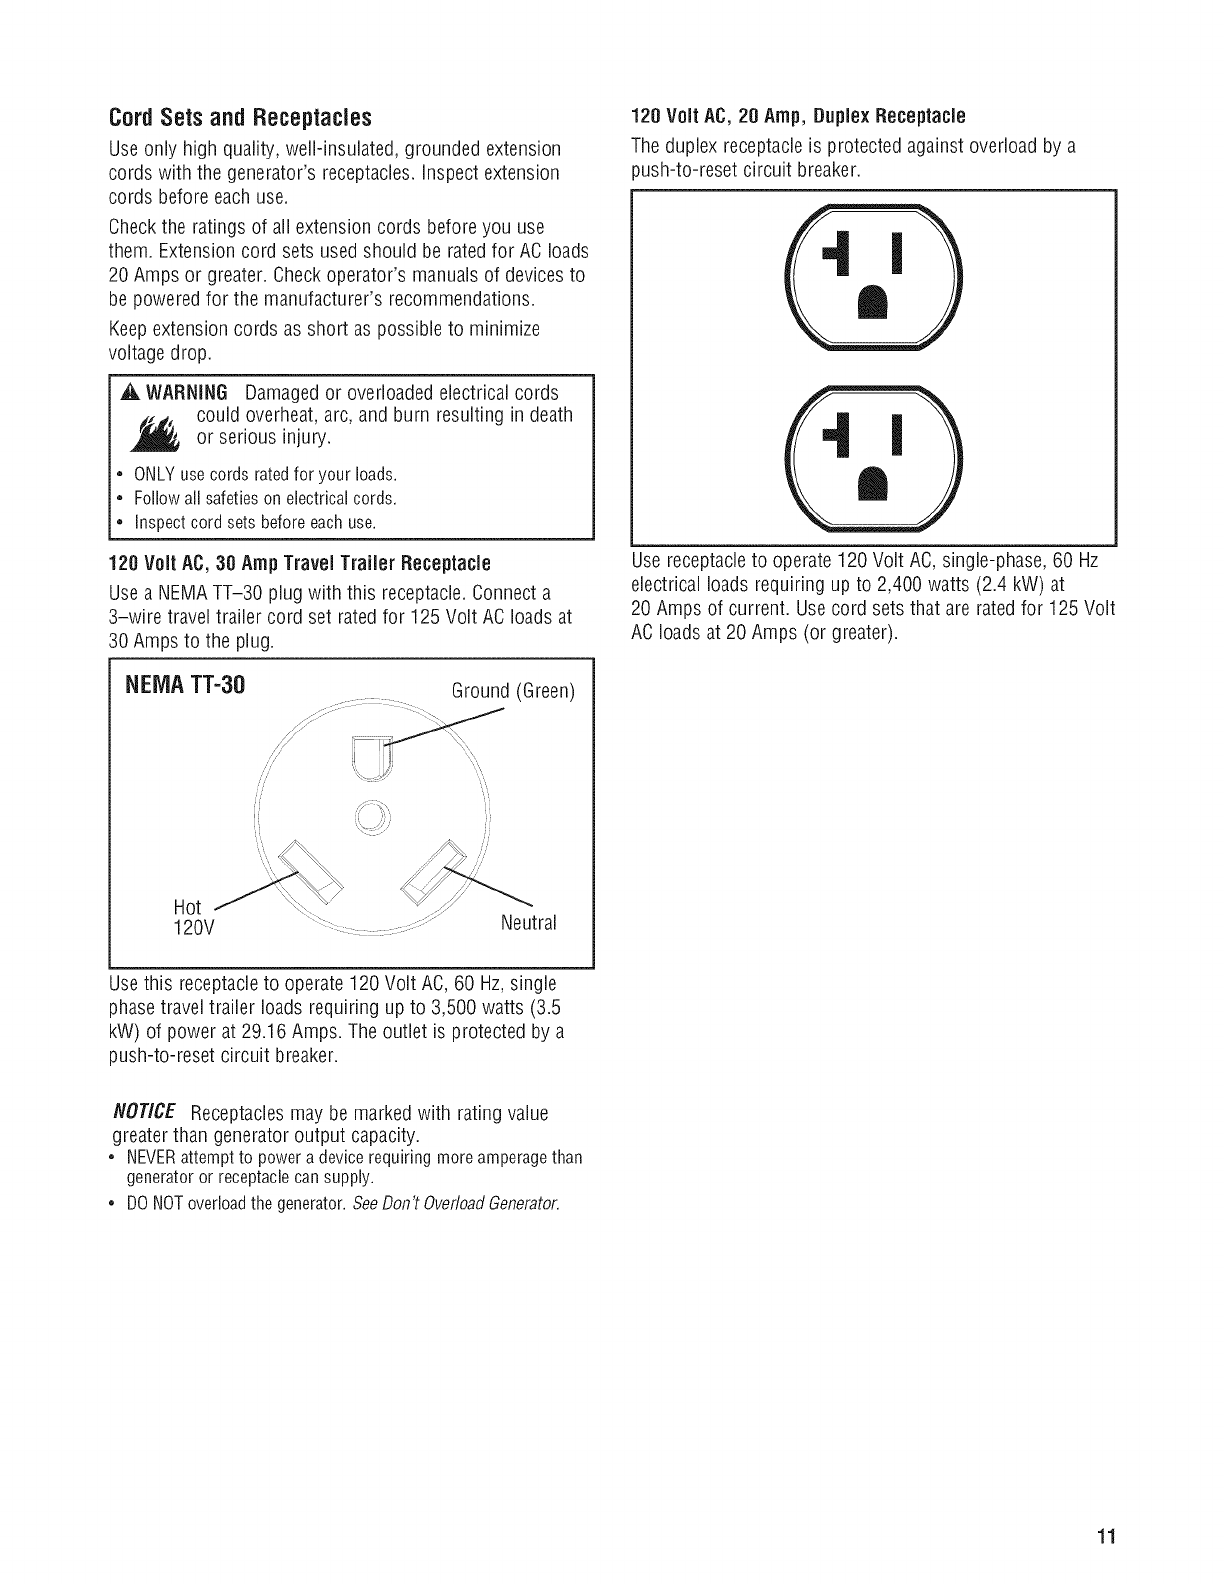 Briggs Stratton 030547 00 User Manual Generator Manuals And Guides Nema Tt 30r Wiring Diagram Cordsets Andreceptacles